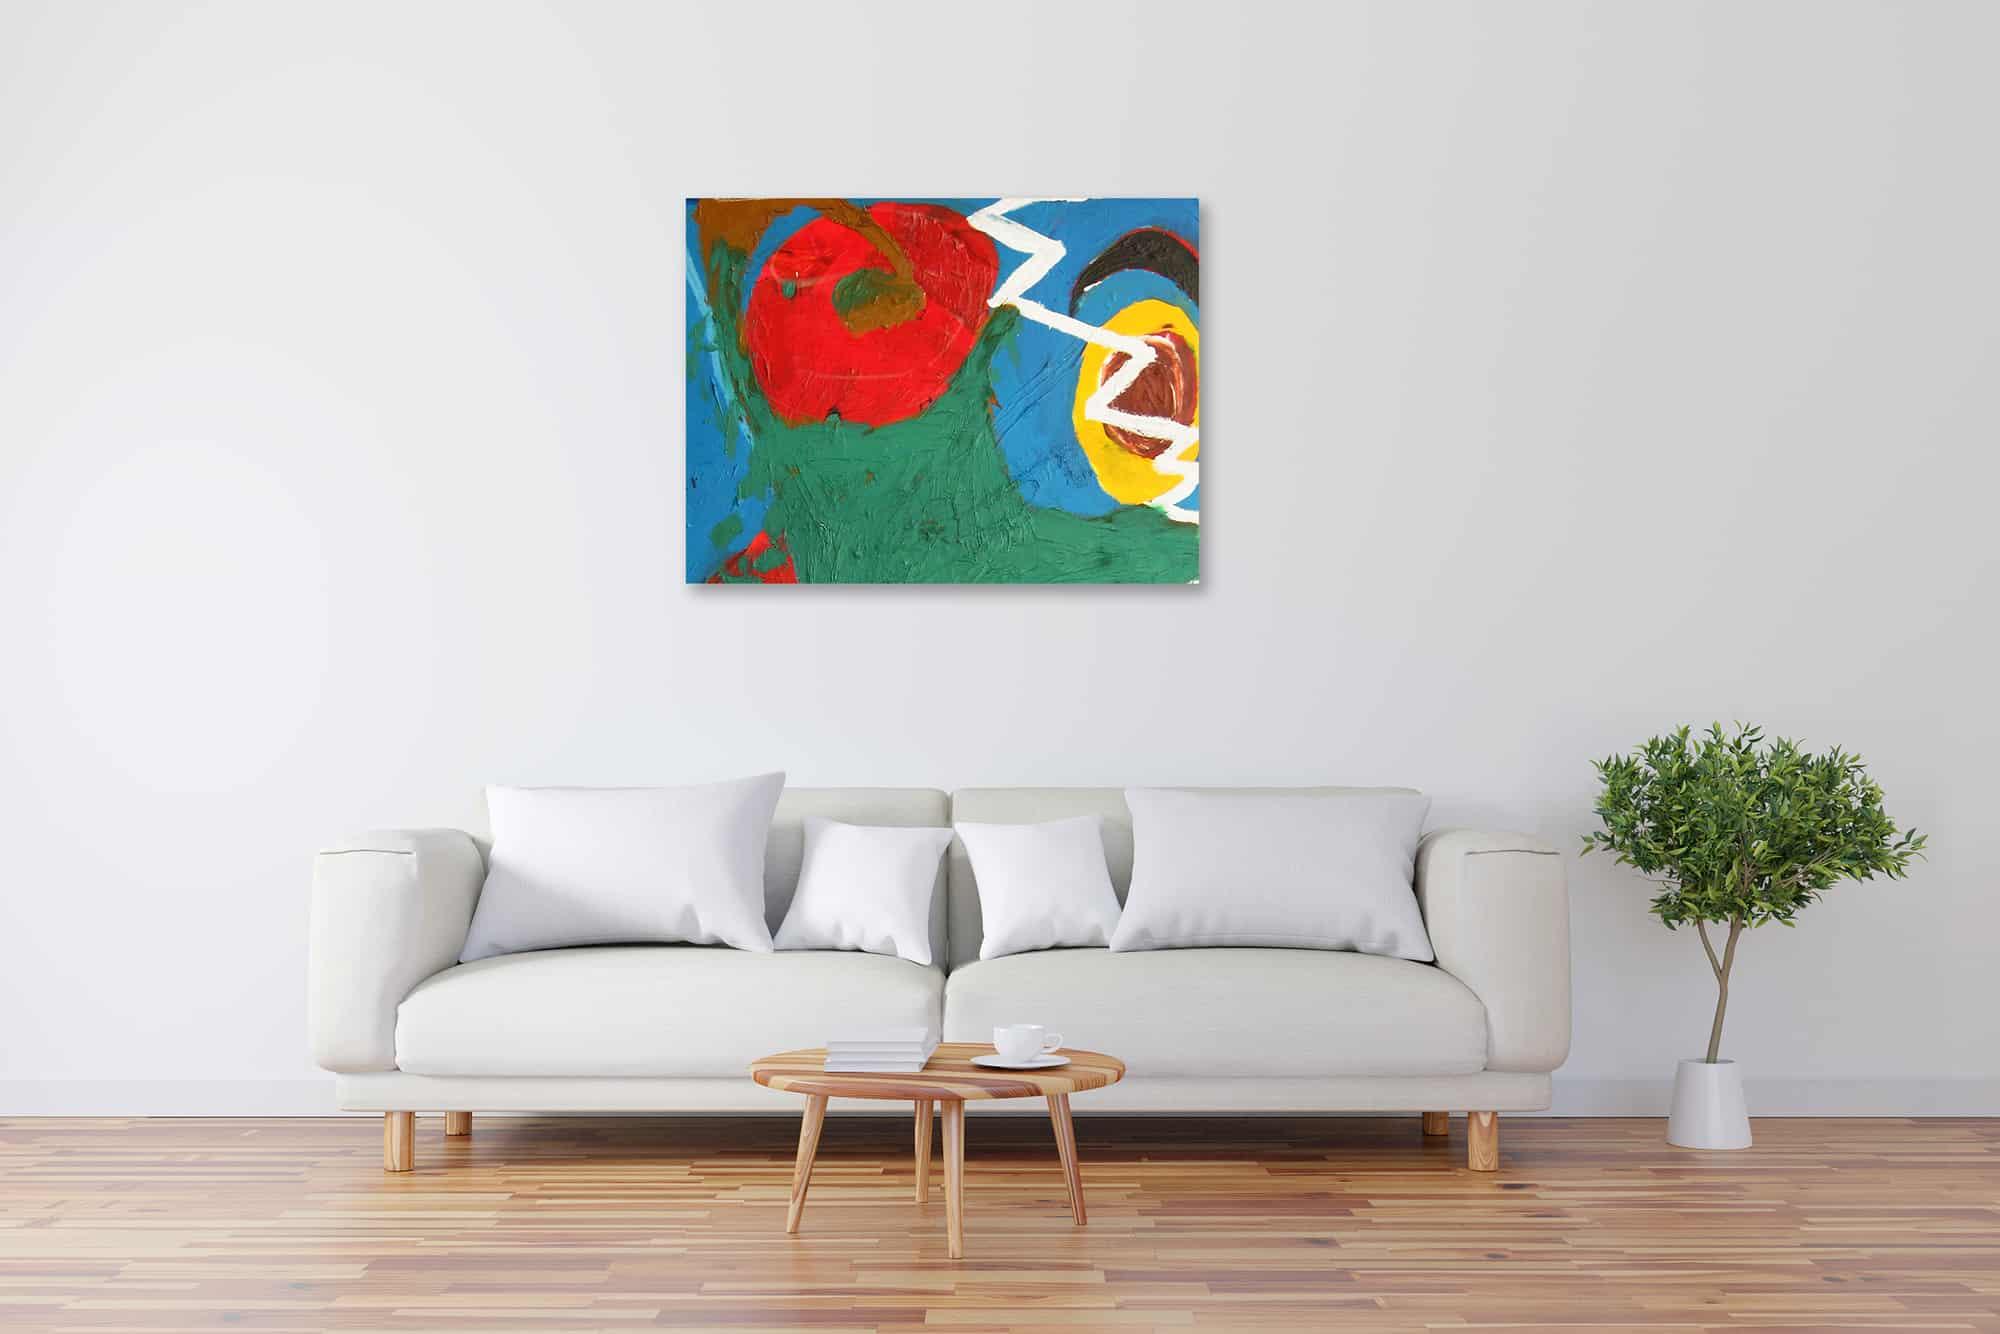 Modernes Acryl Gemälde abstrakt pastos wandbilder